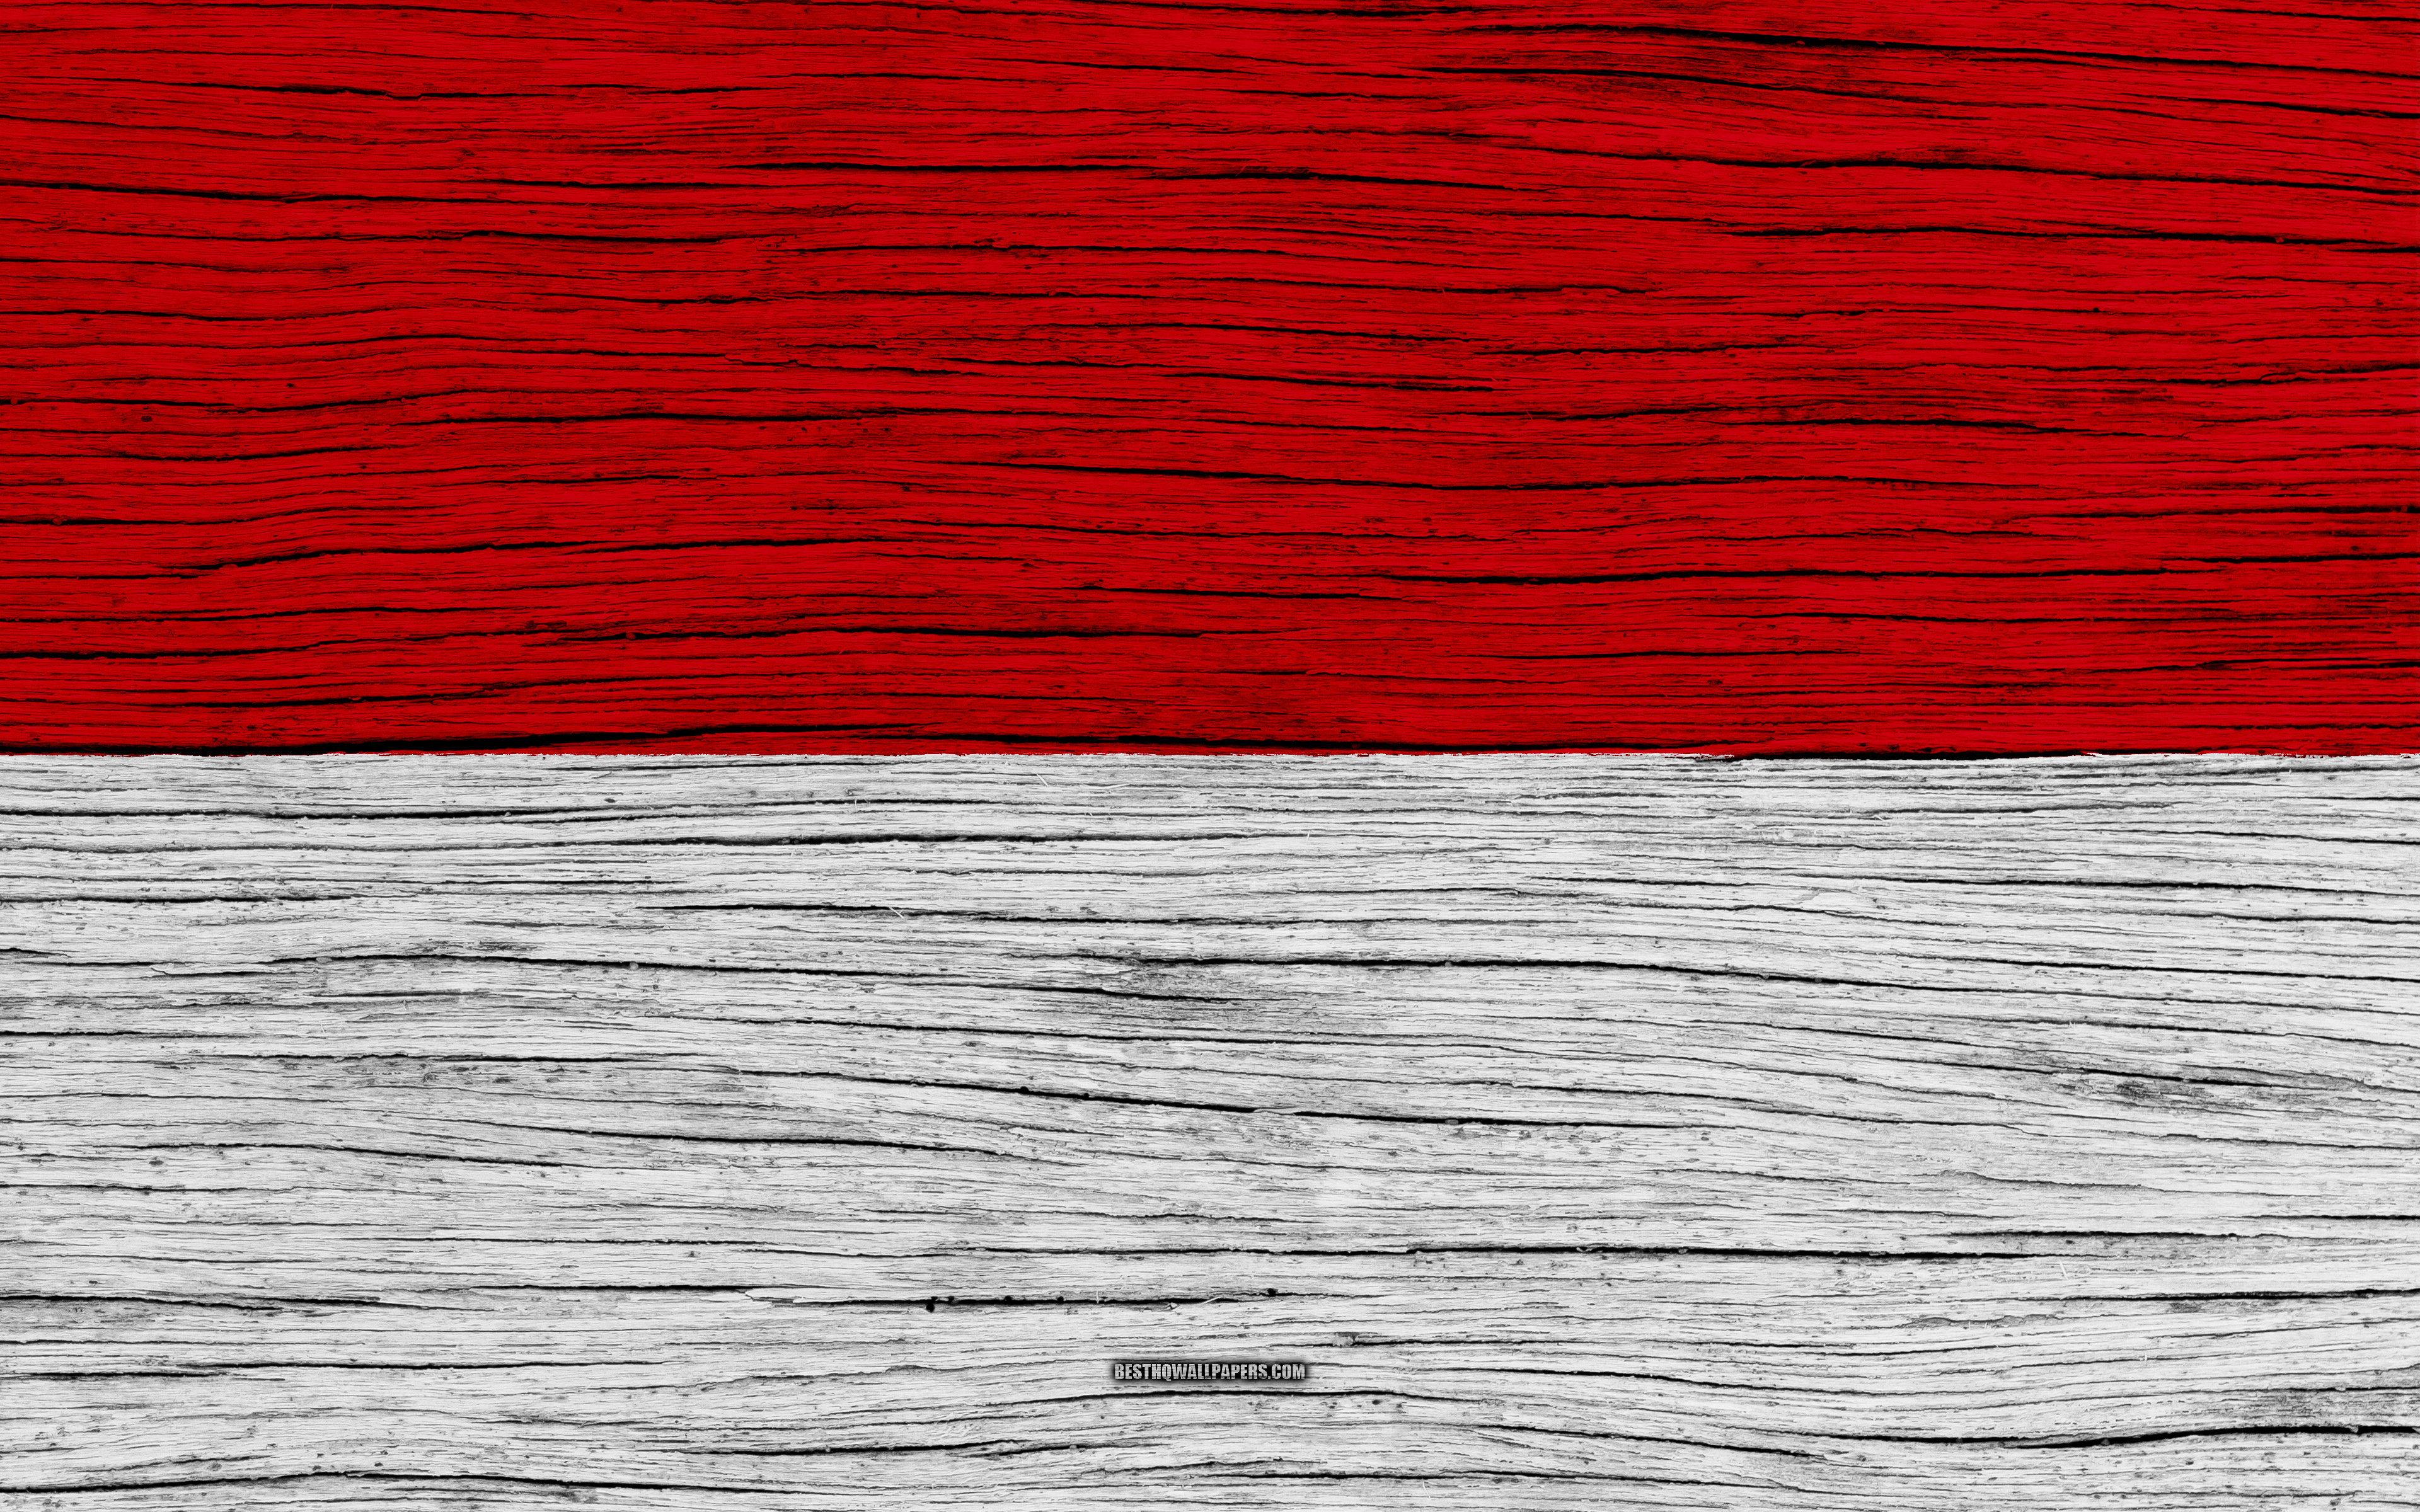 35 indonesia flag wallpapers on wallpapersafari 35 indonesia flag wallpapers on